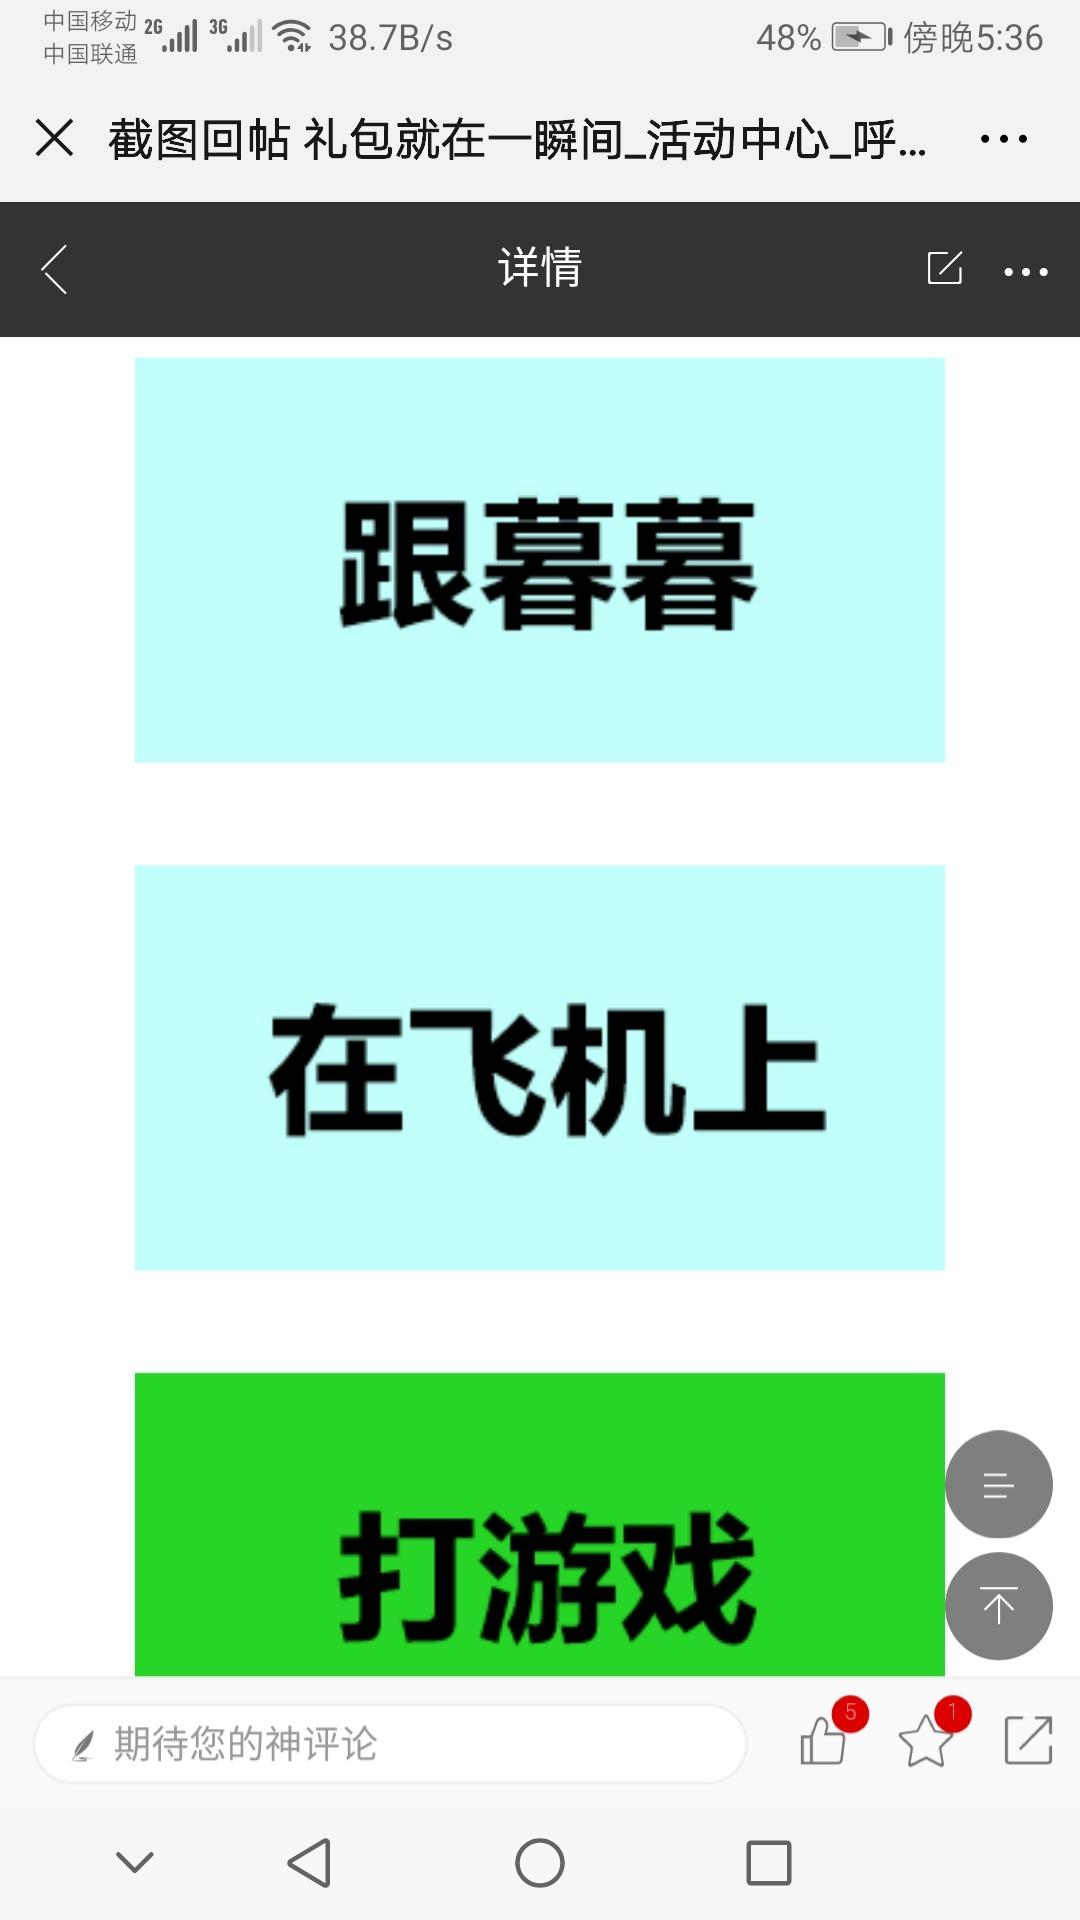 Screenshot_20190725_173620_com.tencent.mm.jpg